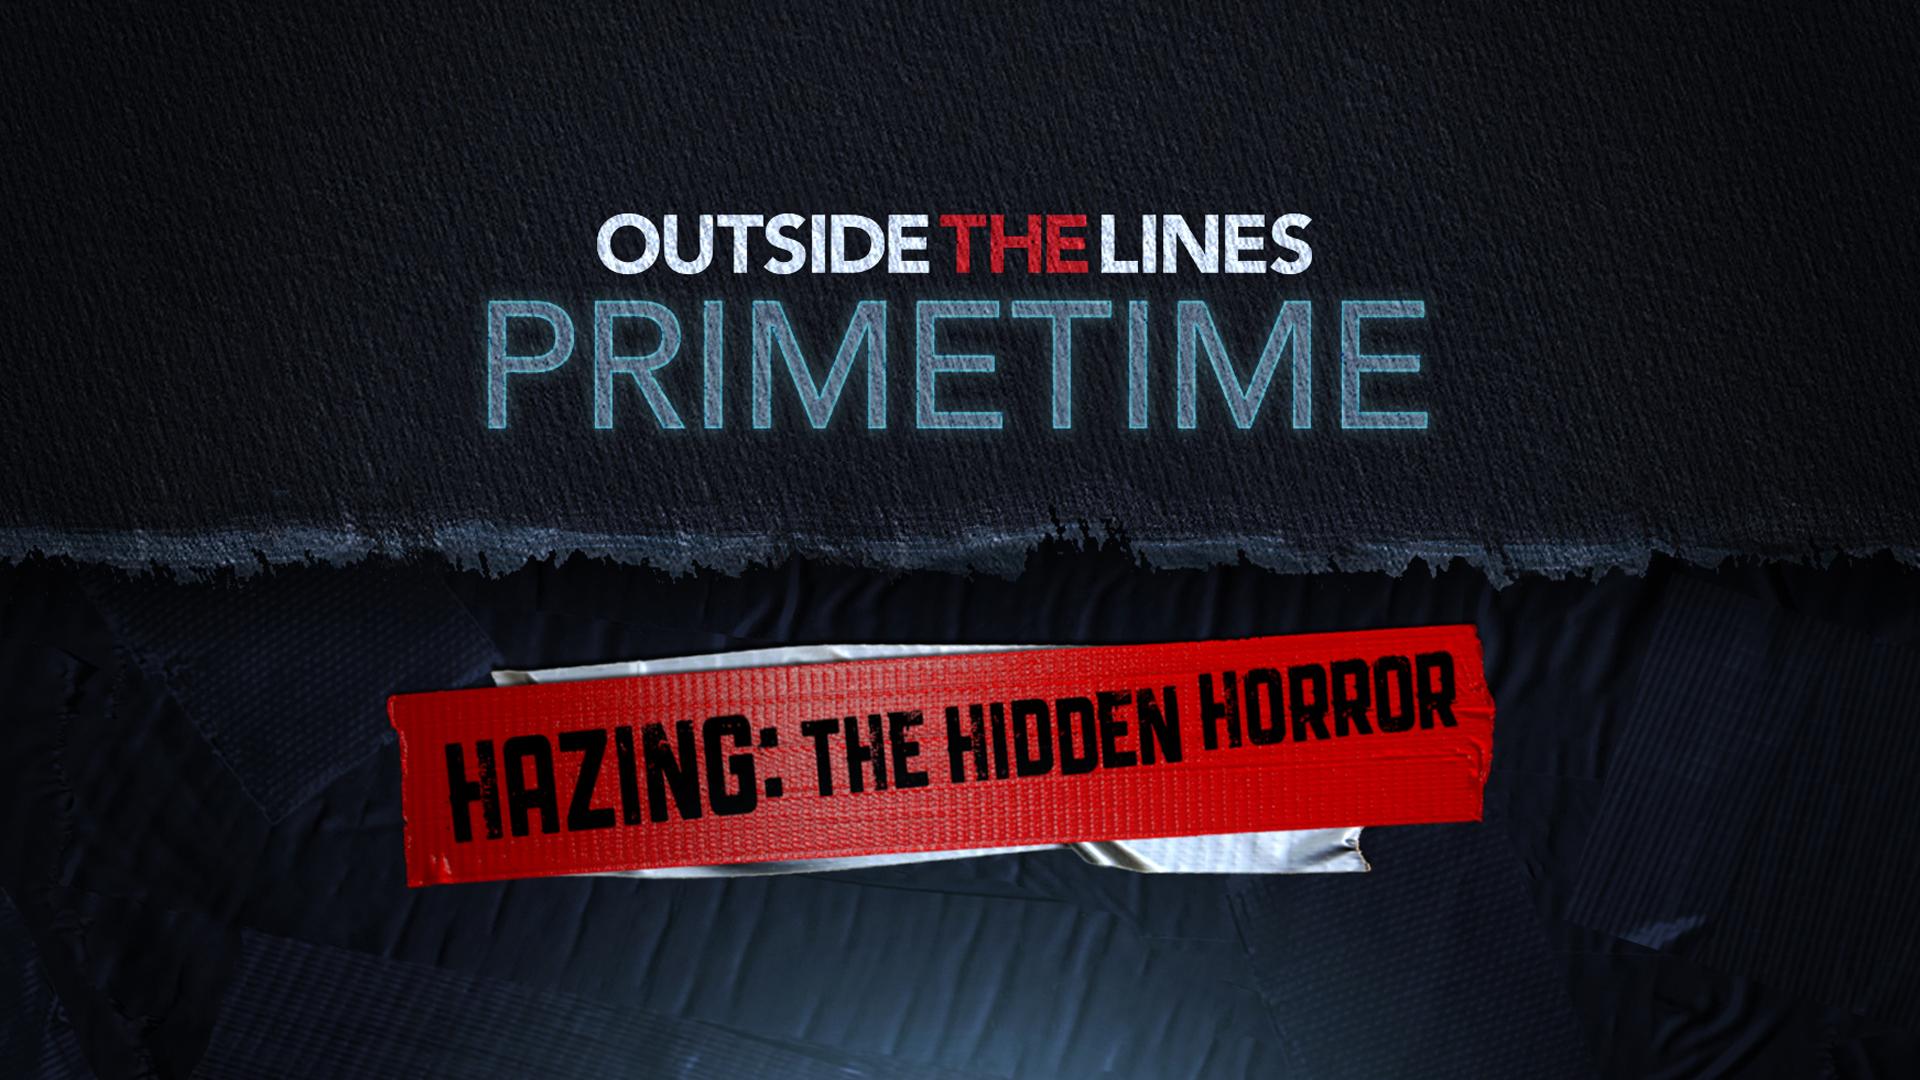 Copy of ESPN OTL - Hazing: The Hidden Horror